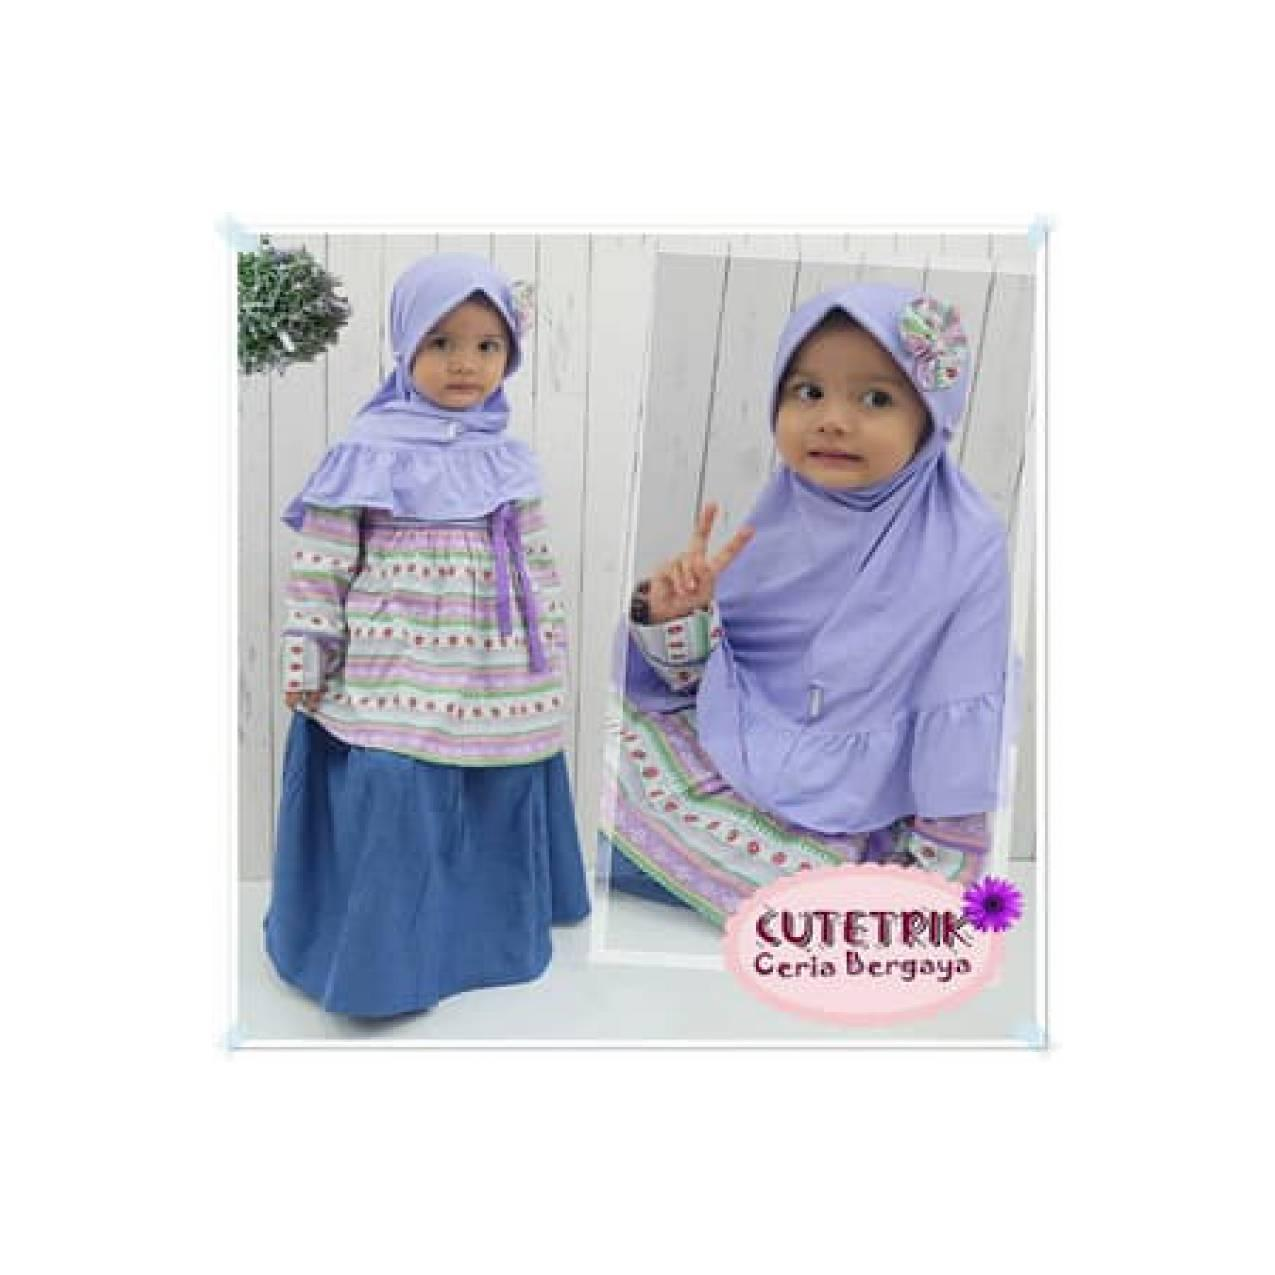 BAJU Tunik & Rok Denim Cutetrik NX12 -Baju Muslim Anak NX 12